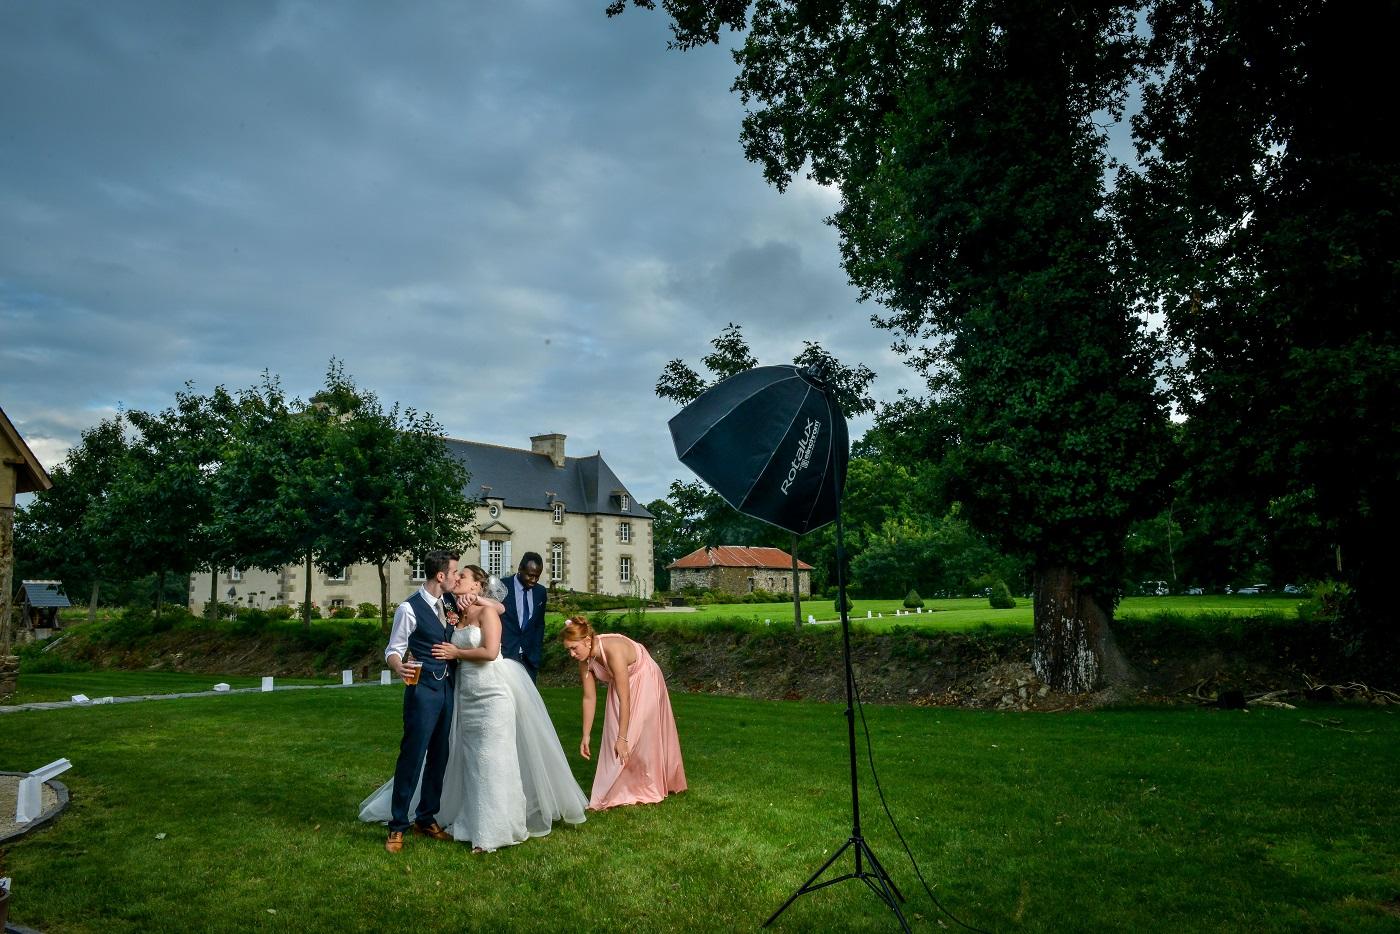 mariage-bellenoe-dol-de-bretagne-seance-photo.jpg